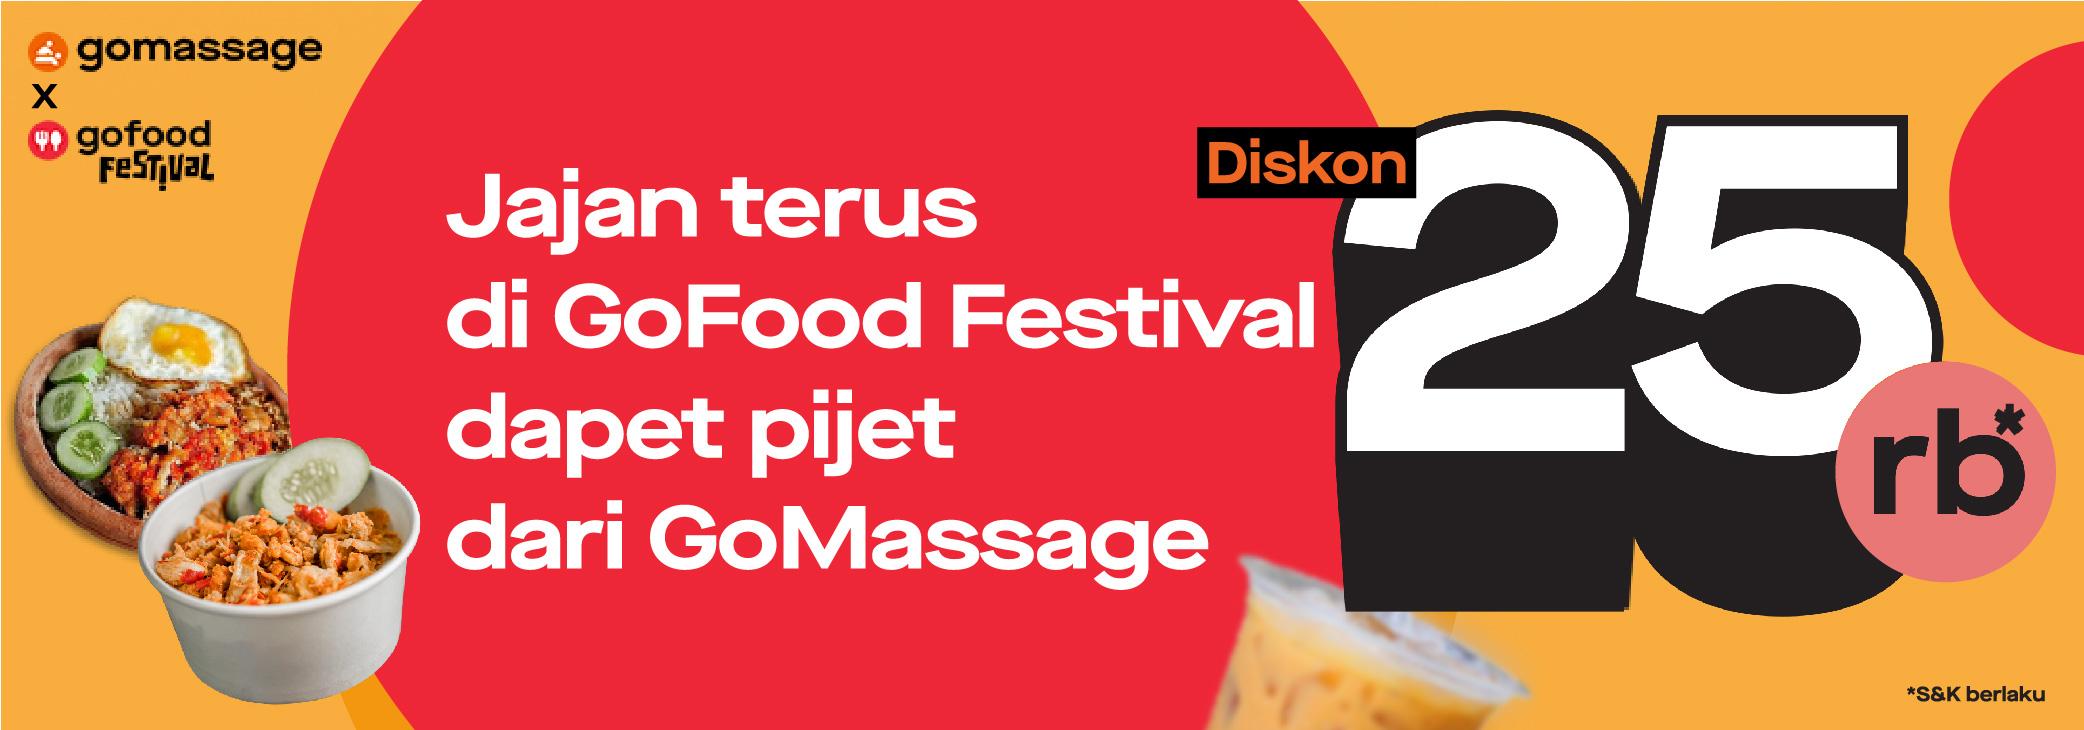 Misi Seru GoFood Festival : Dapatkan Voucher GoMassage senilai Rp25.000